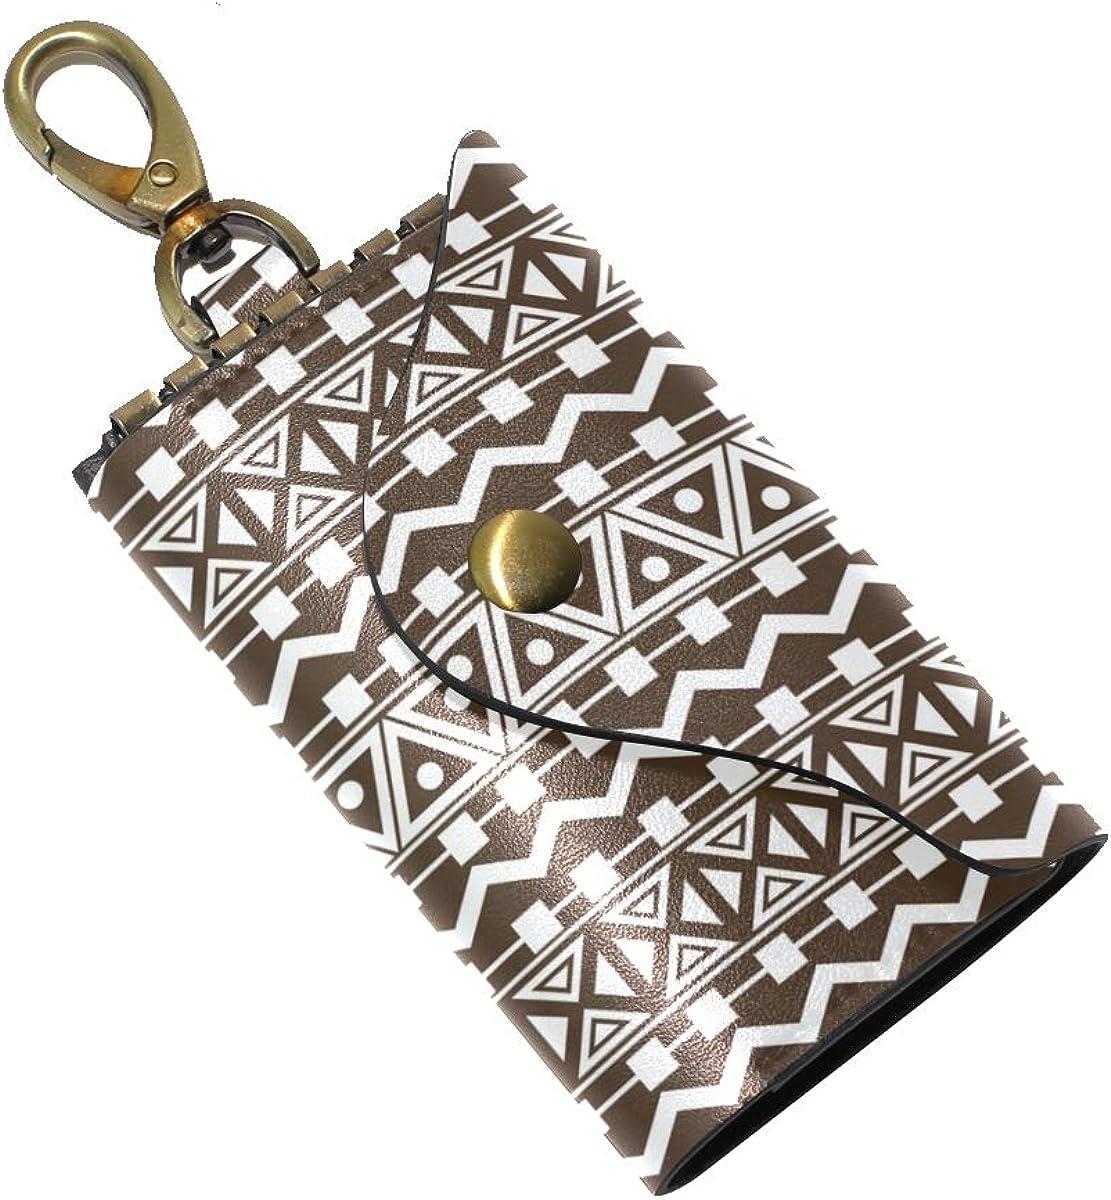 KEAKIA Cross Designs Leather Key Case Wallets Tri-fold Key Holder Keychains with 6 Hooks 2 Slot Snap Closure for Men Women